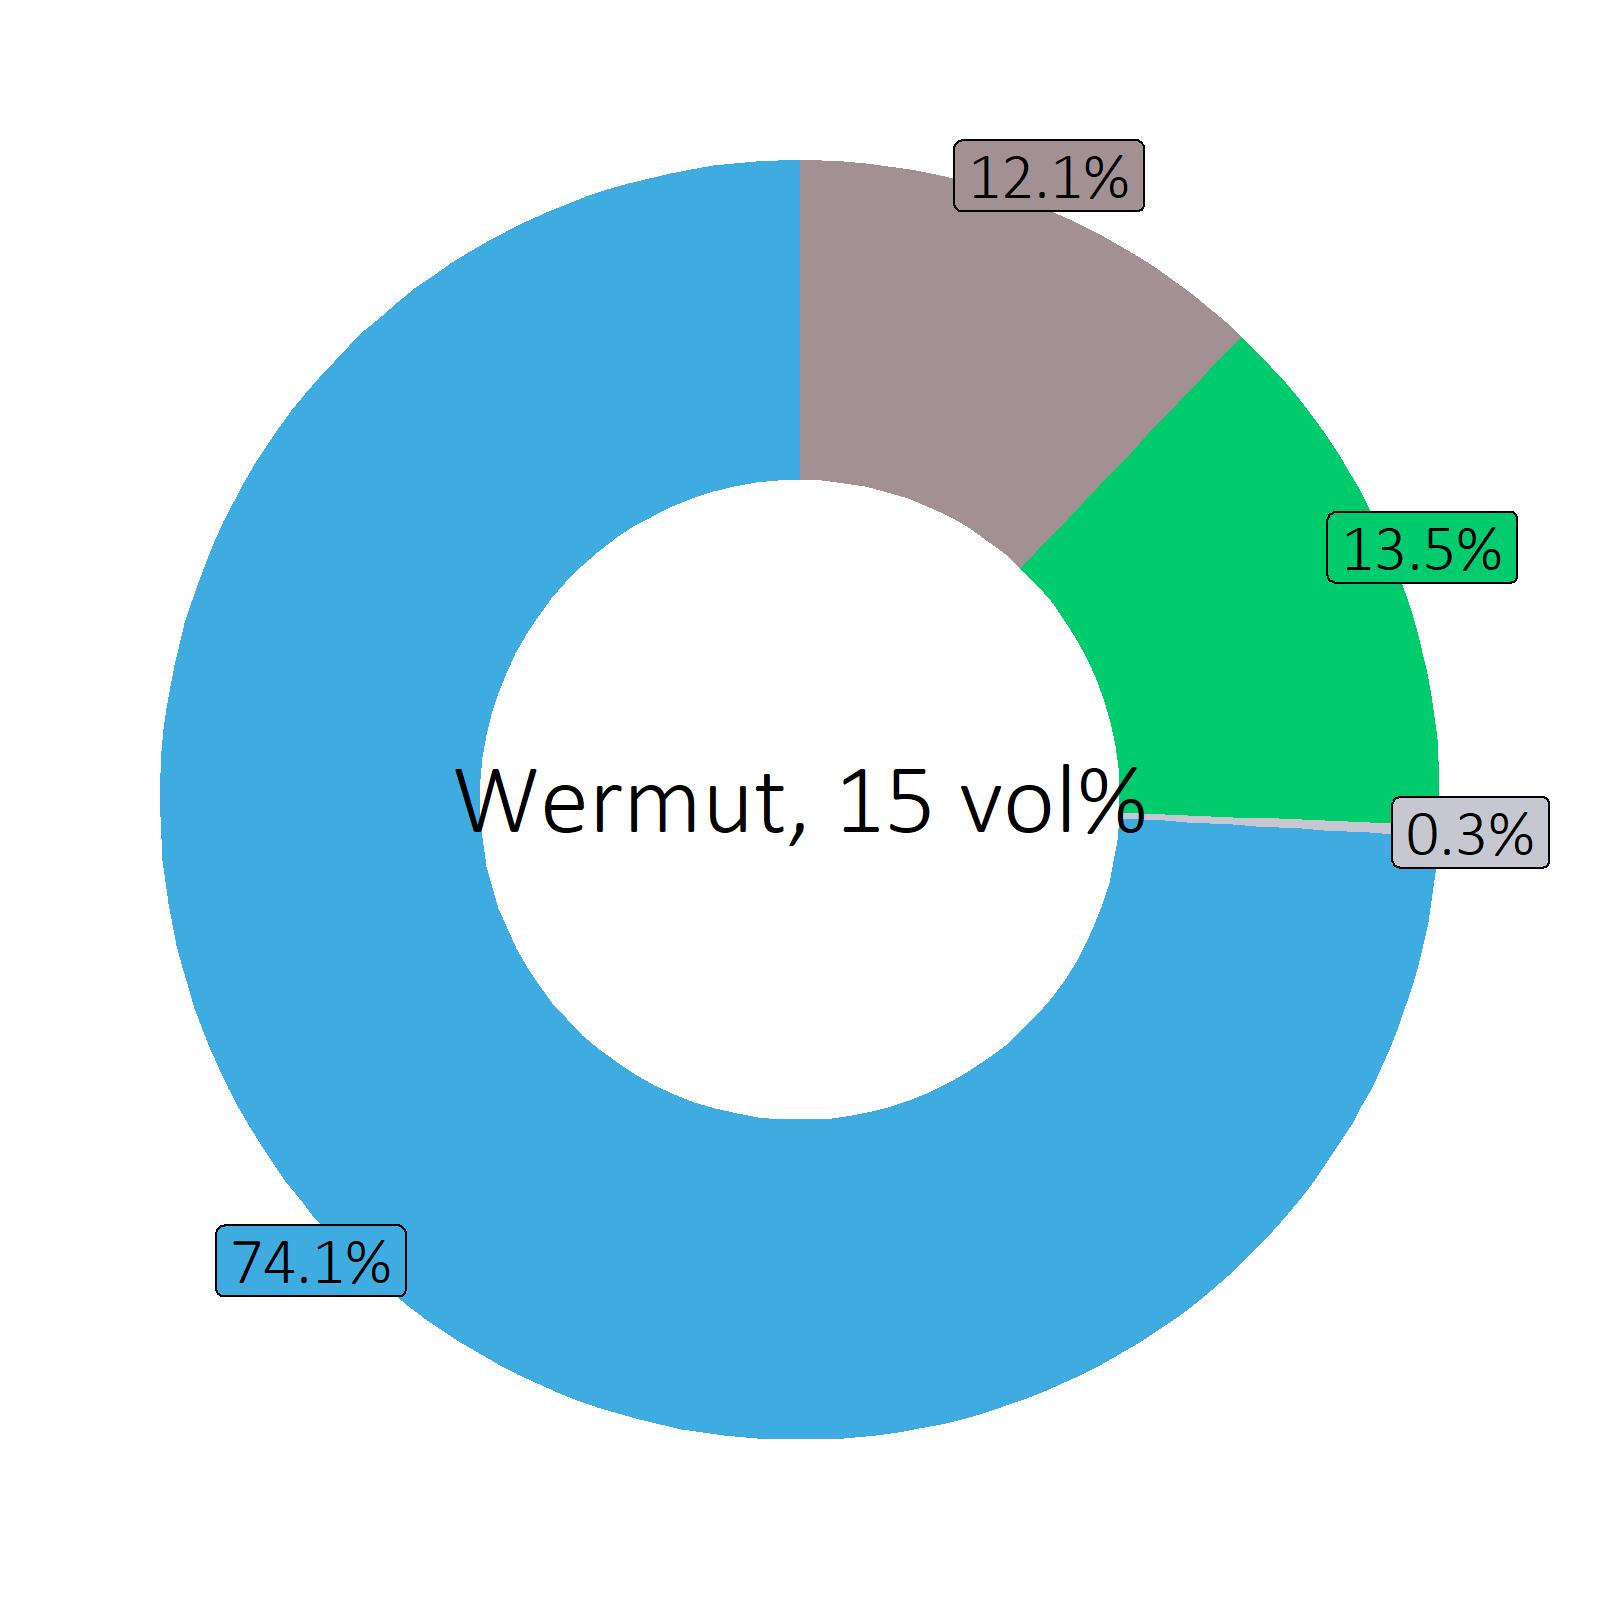 Bestandteile Wermut, 15 vol%